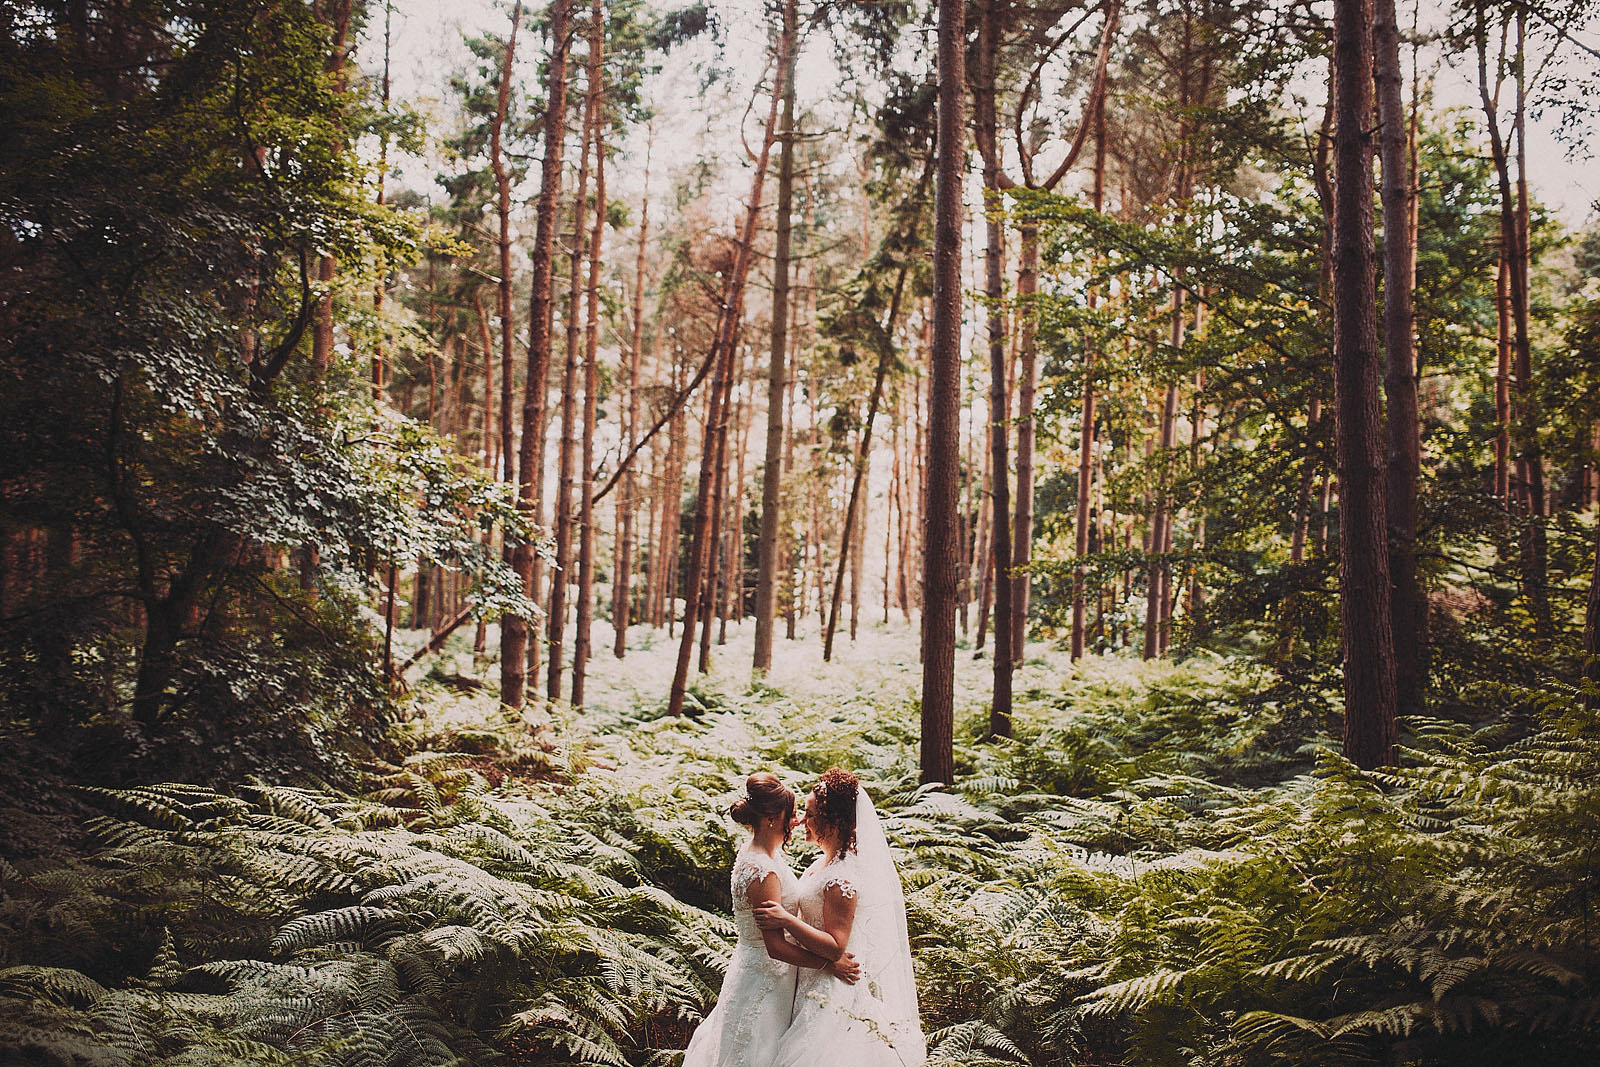 Lawson_Best_Wedding_2015_130